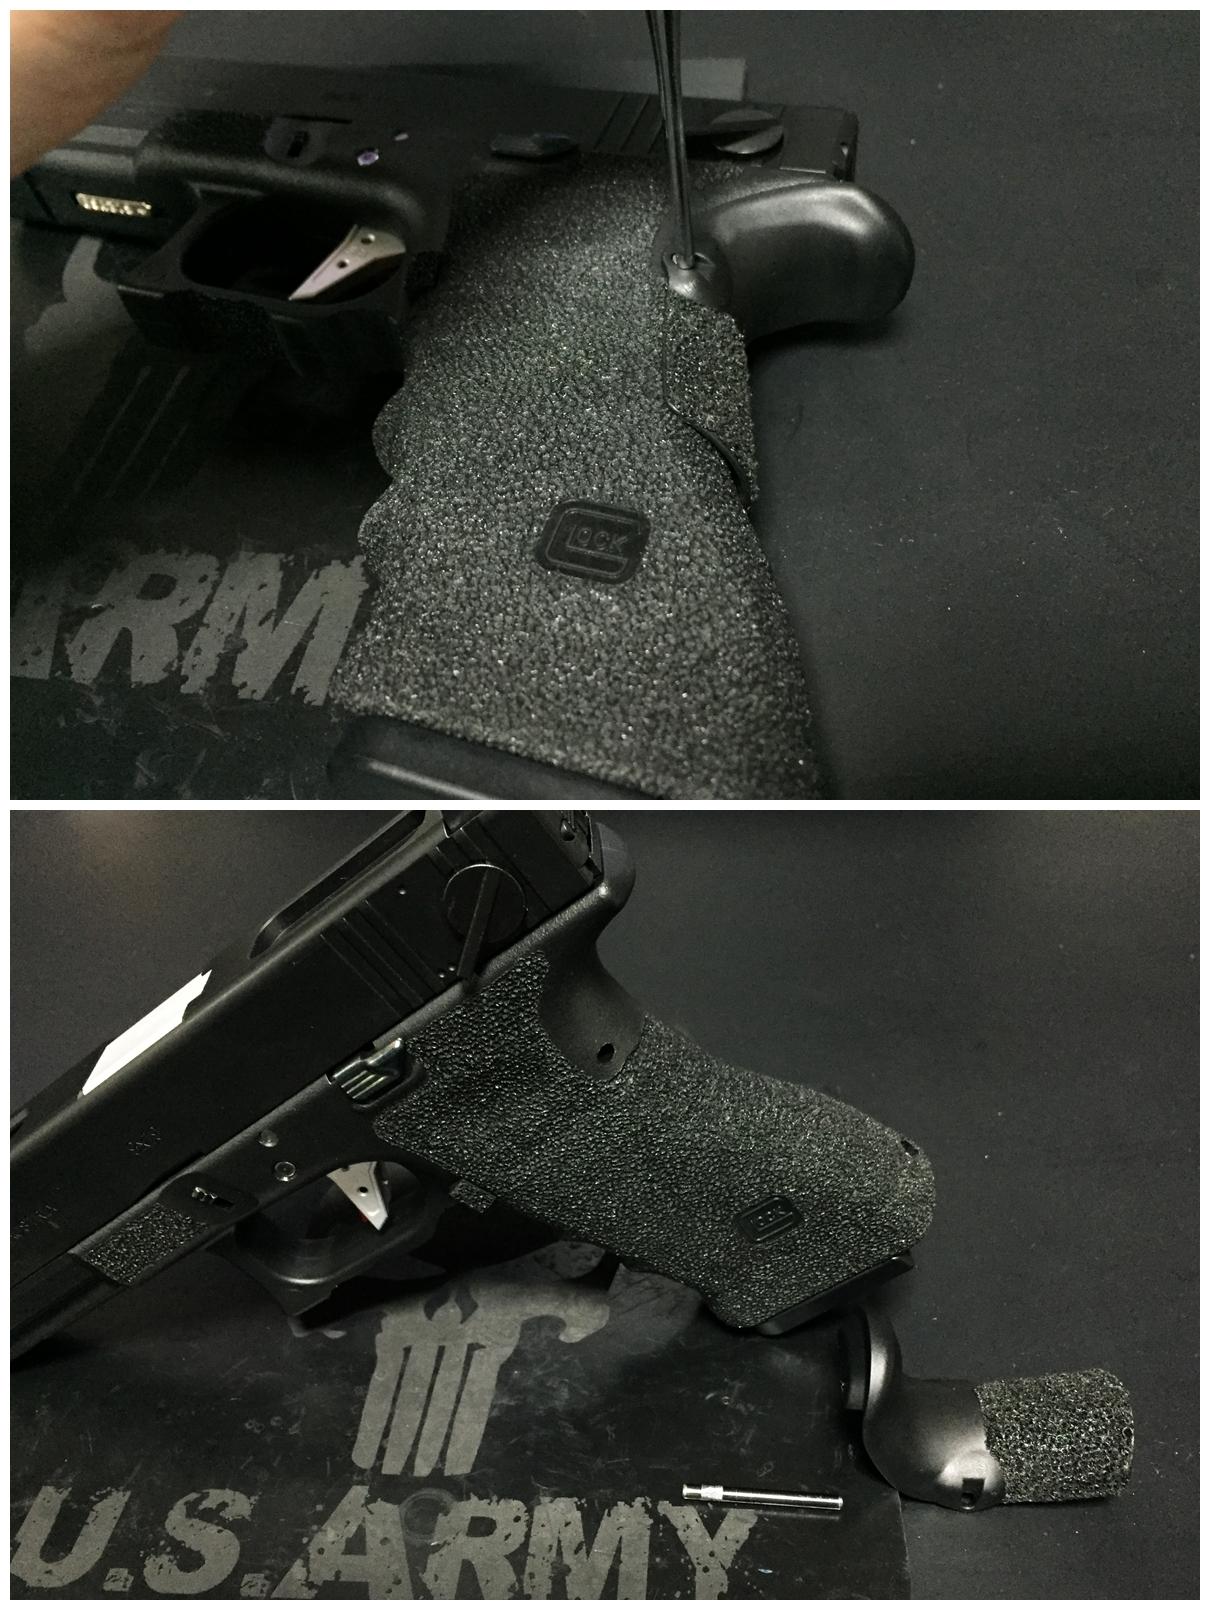 3 GLOCK グロックG UARDER 実銃素材 ビーバーテール 専用 DIY 自作 刻印入り クッション パット 作製 取付 加工 カスタム